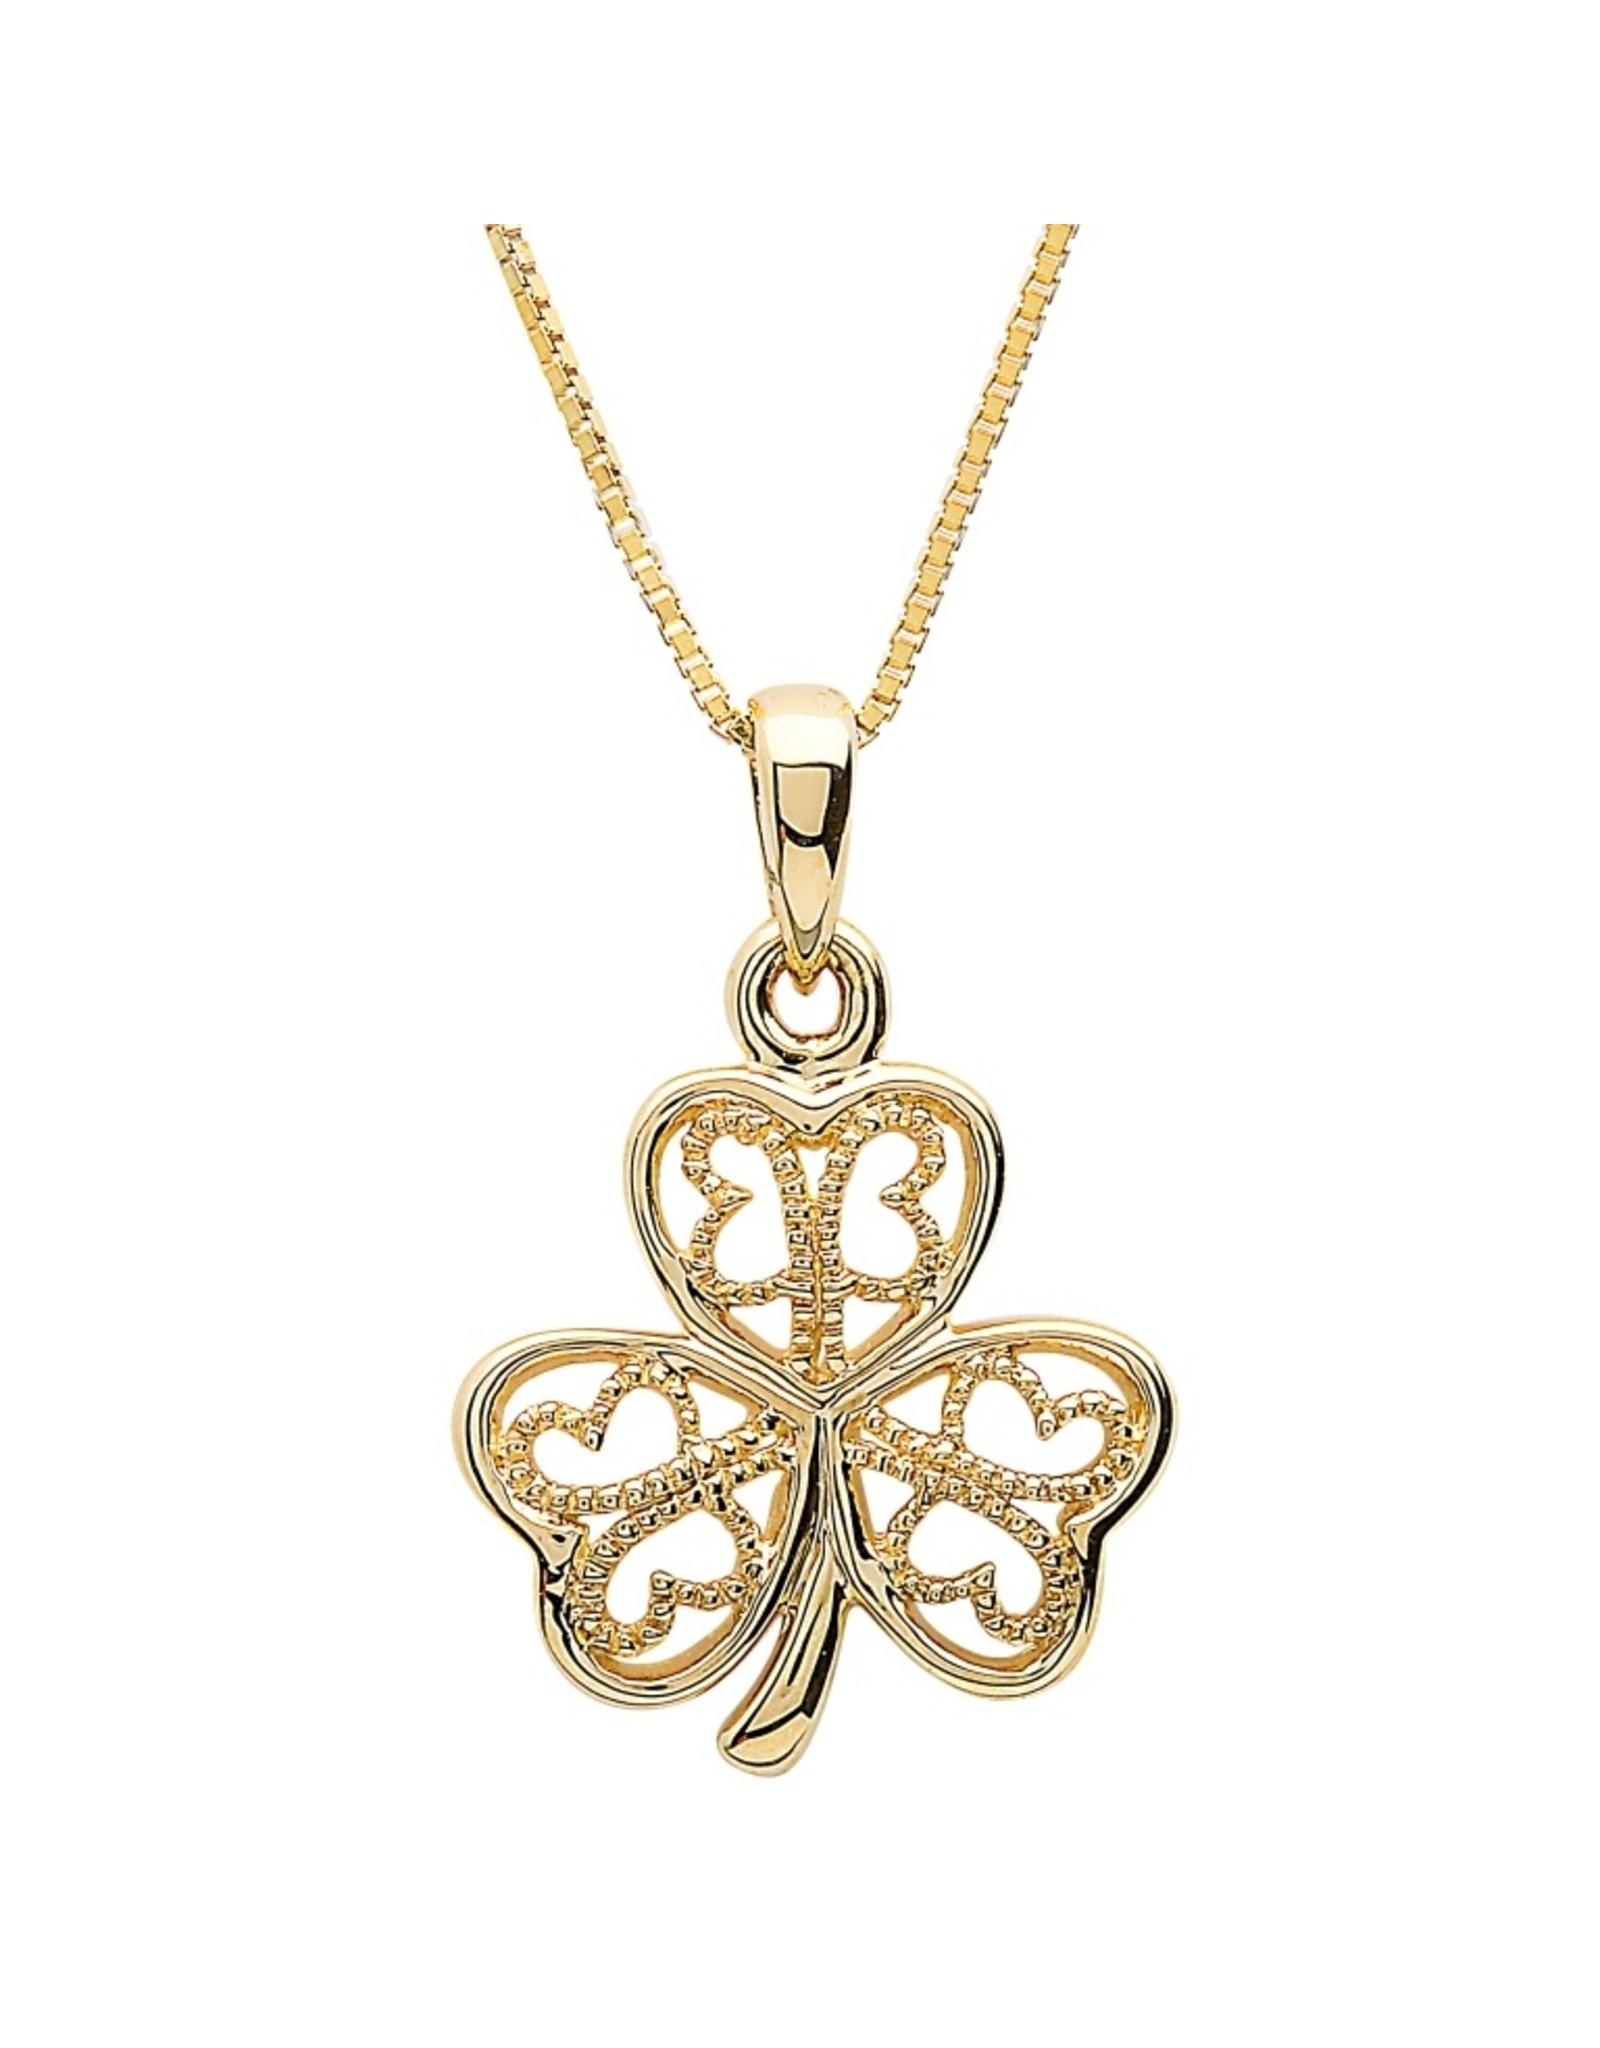 Shanore 10k Gold Shamrock Necklace